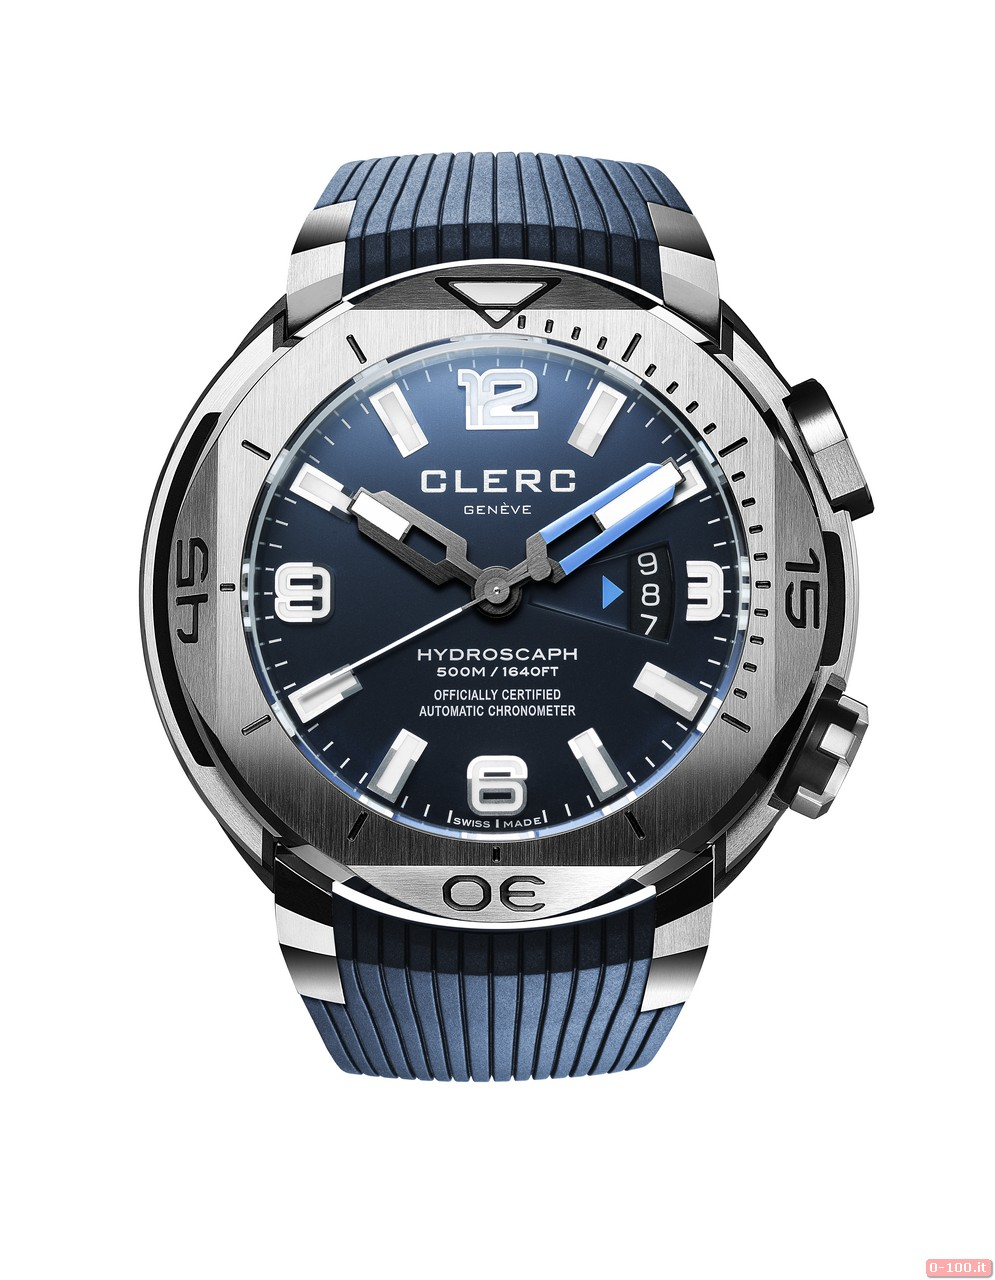 anteprima-baselworld-2014-clerc-hydroscaph-h1-chronometer_0-1001